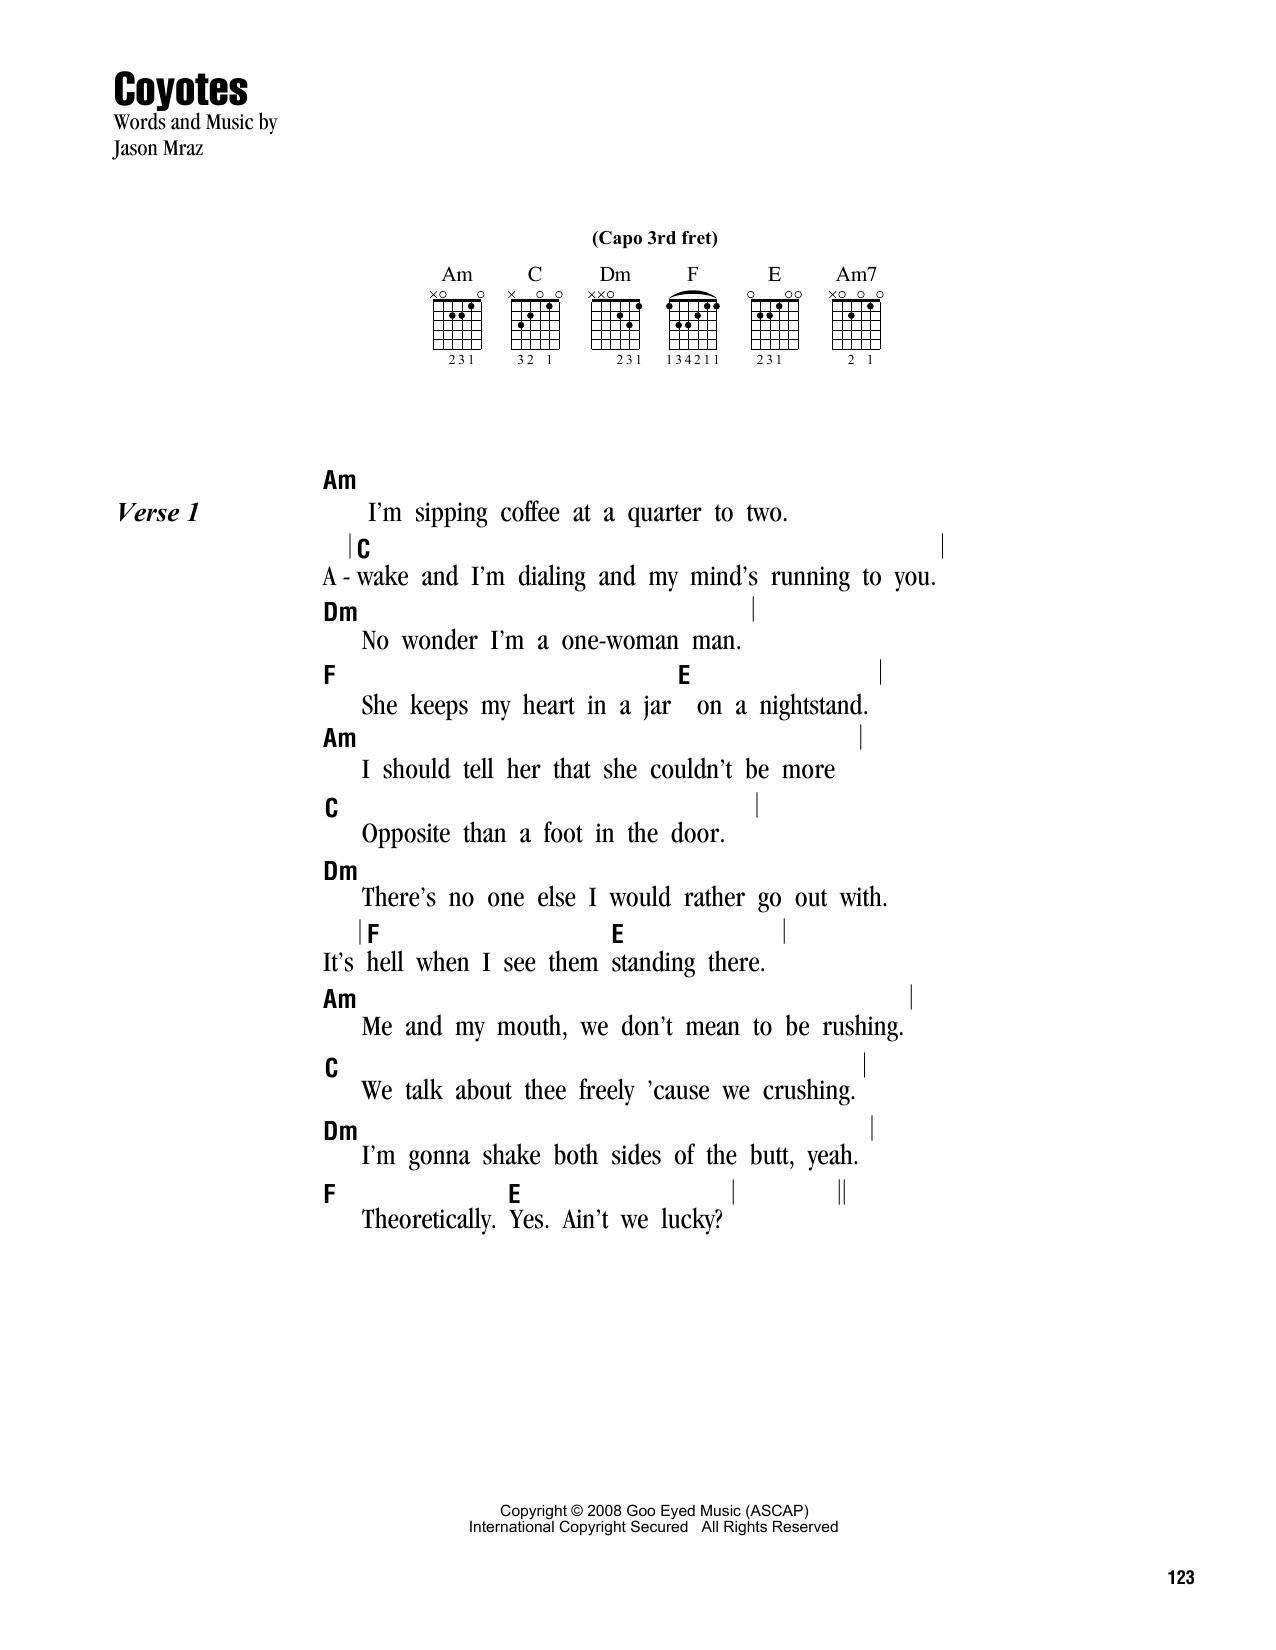 Coyotes (Guitar Chords/Lyrics)